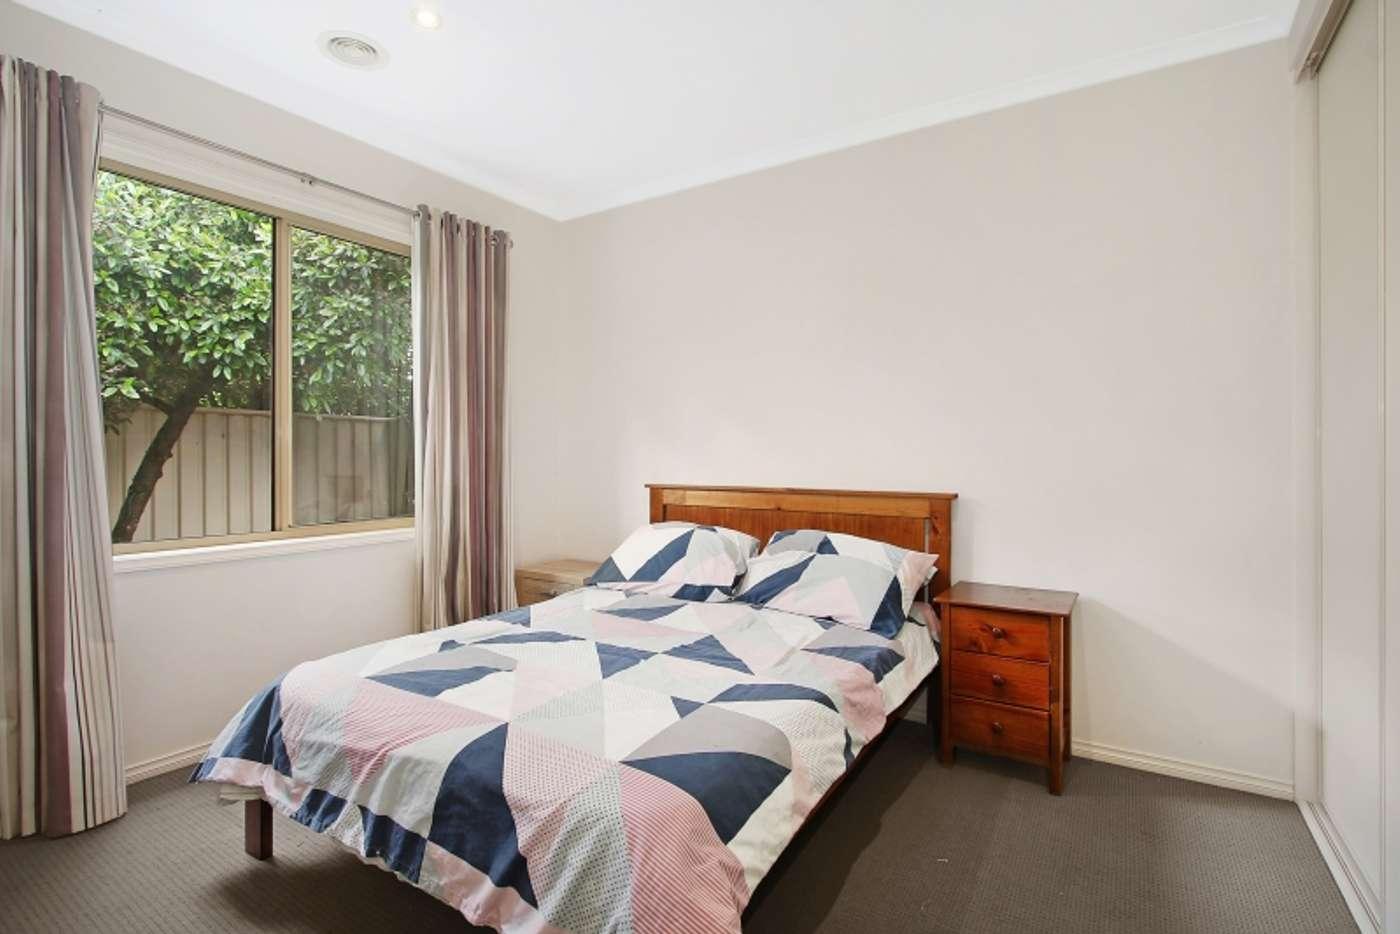 Sixth view of Homely house listing, 94 YARRALUMLA DRIVE, Wodonga VIC 3690